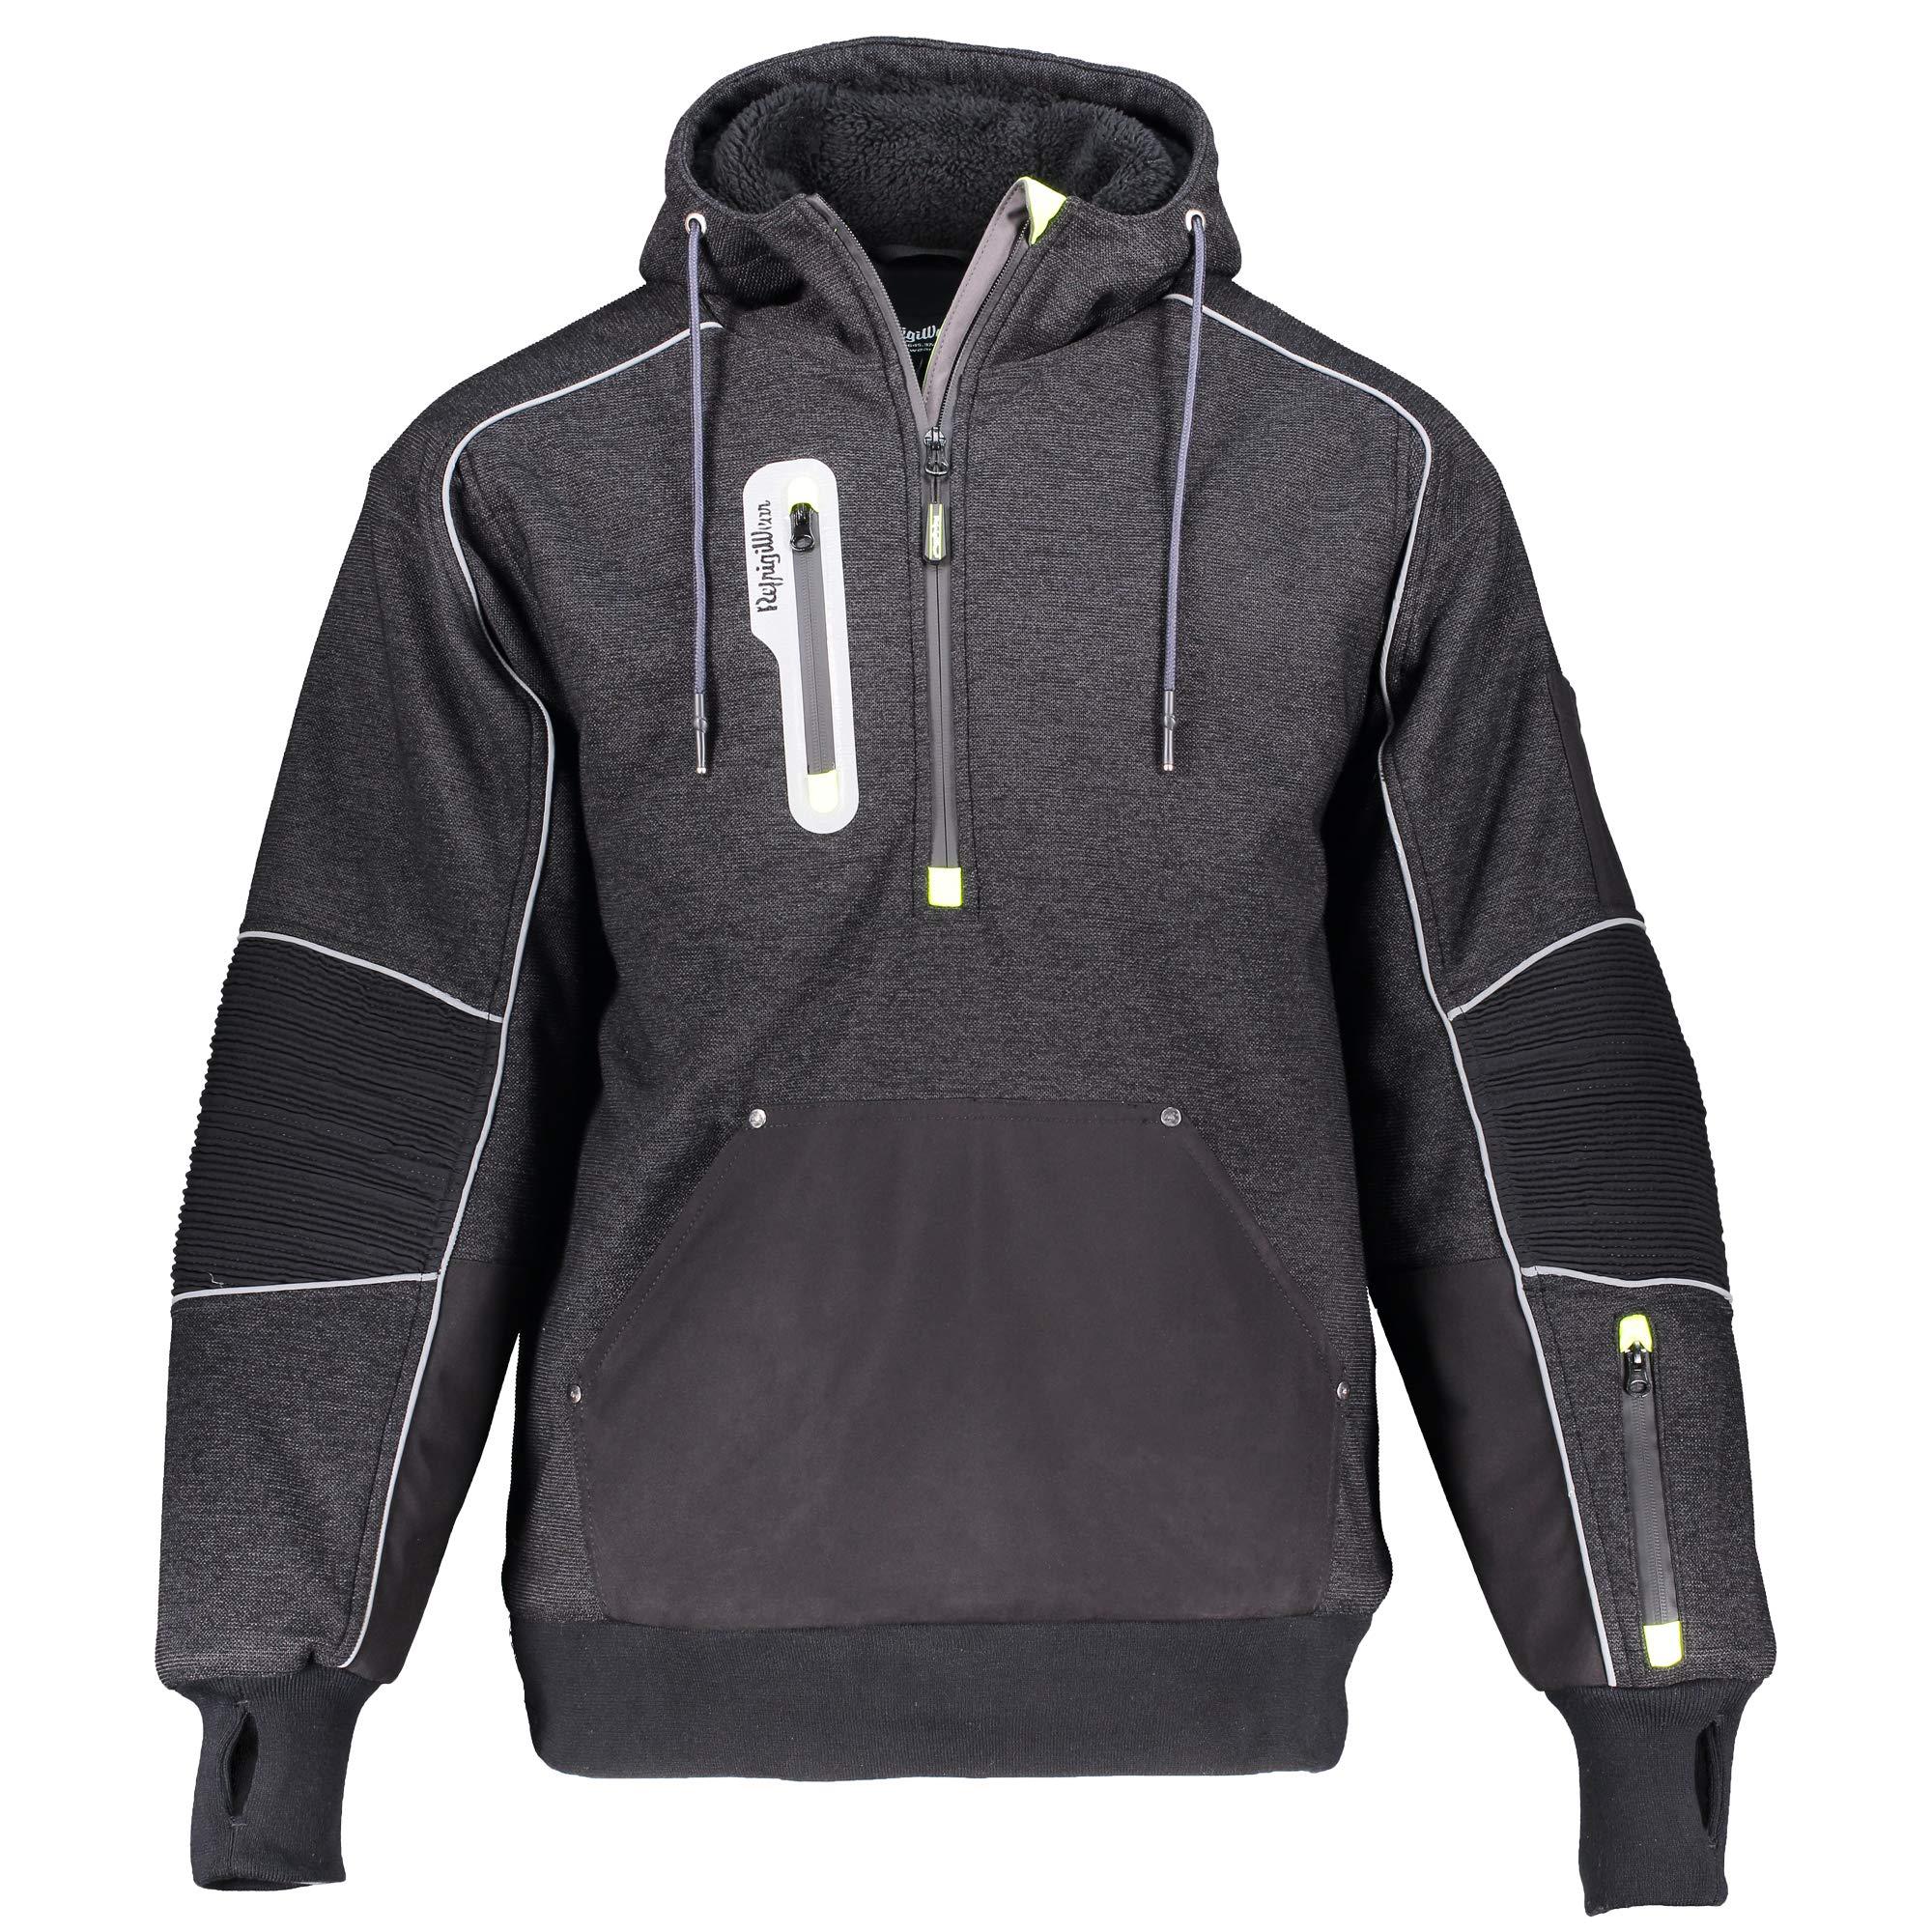 RefrigiWear Men's Extreme Hybrid Insulated Pullover Sweatshirt Hoodie with Performance-Flex (Black, 3XL)